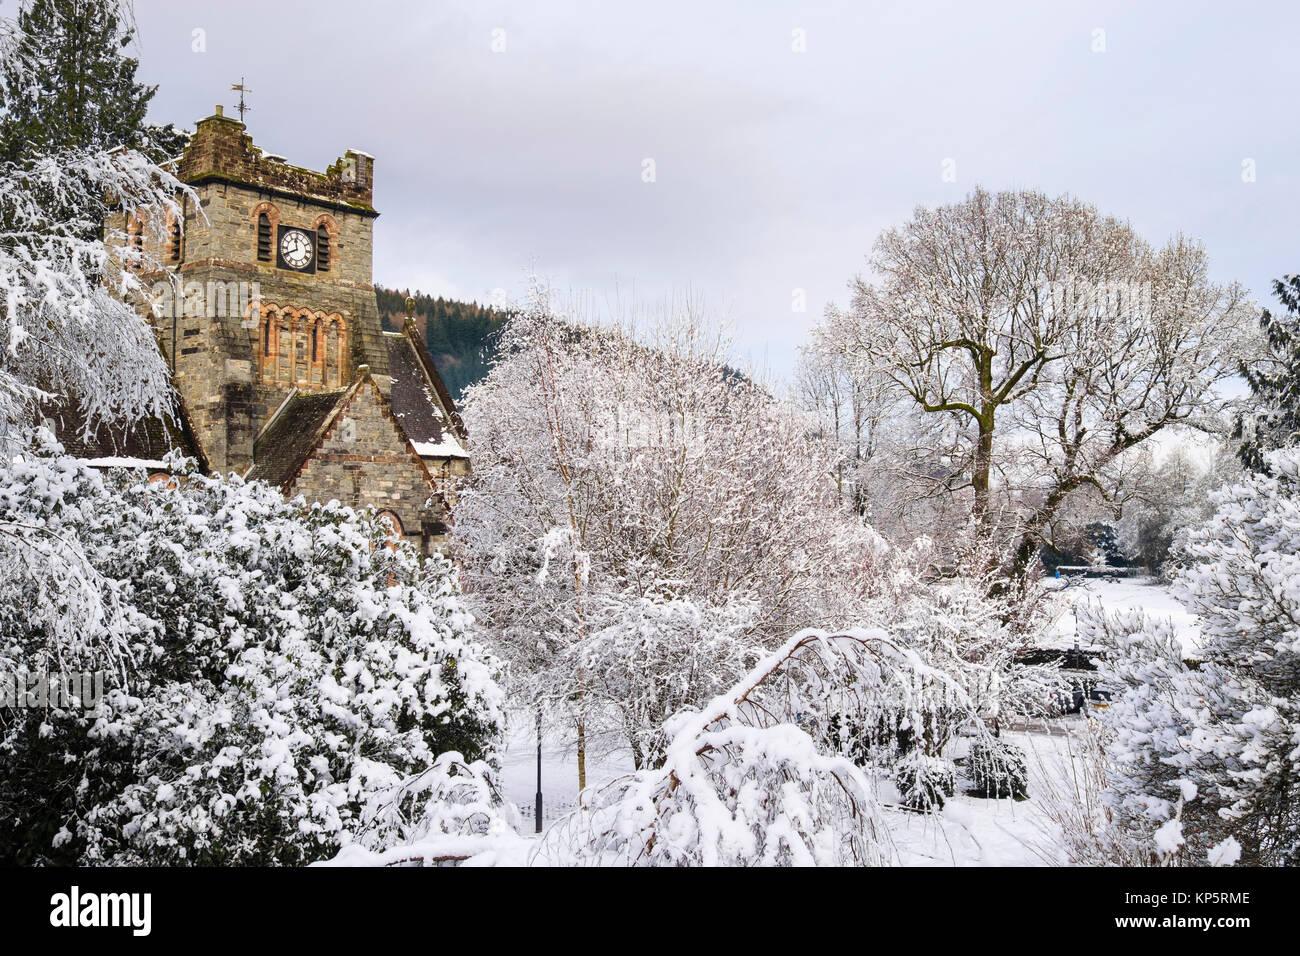 Churches In Snow Stock Photos Amp Churches In Snow Stock